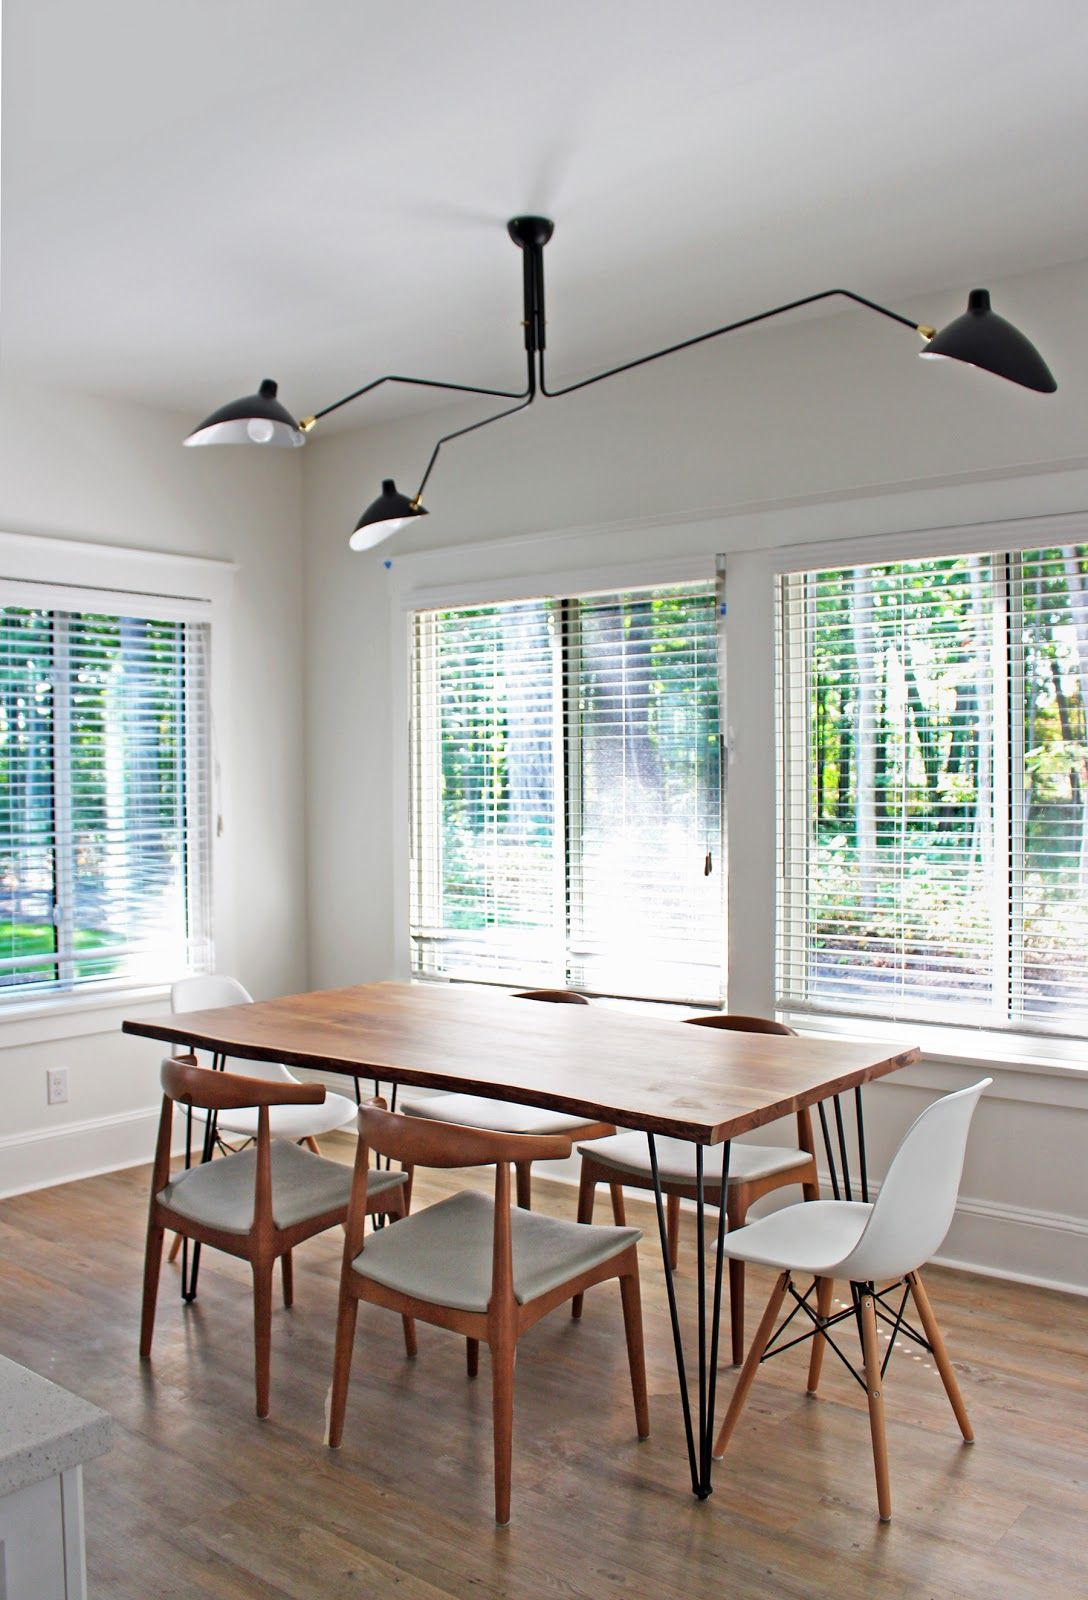 Cottage Dining Room Serge Mouille 3 Arm Ceiling Light